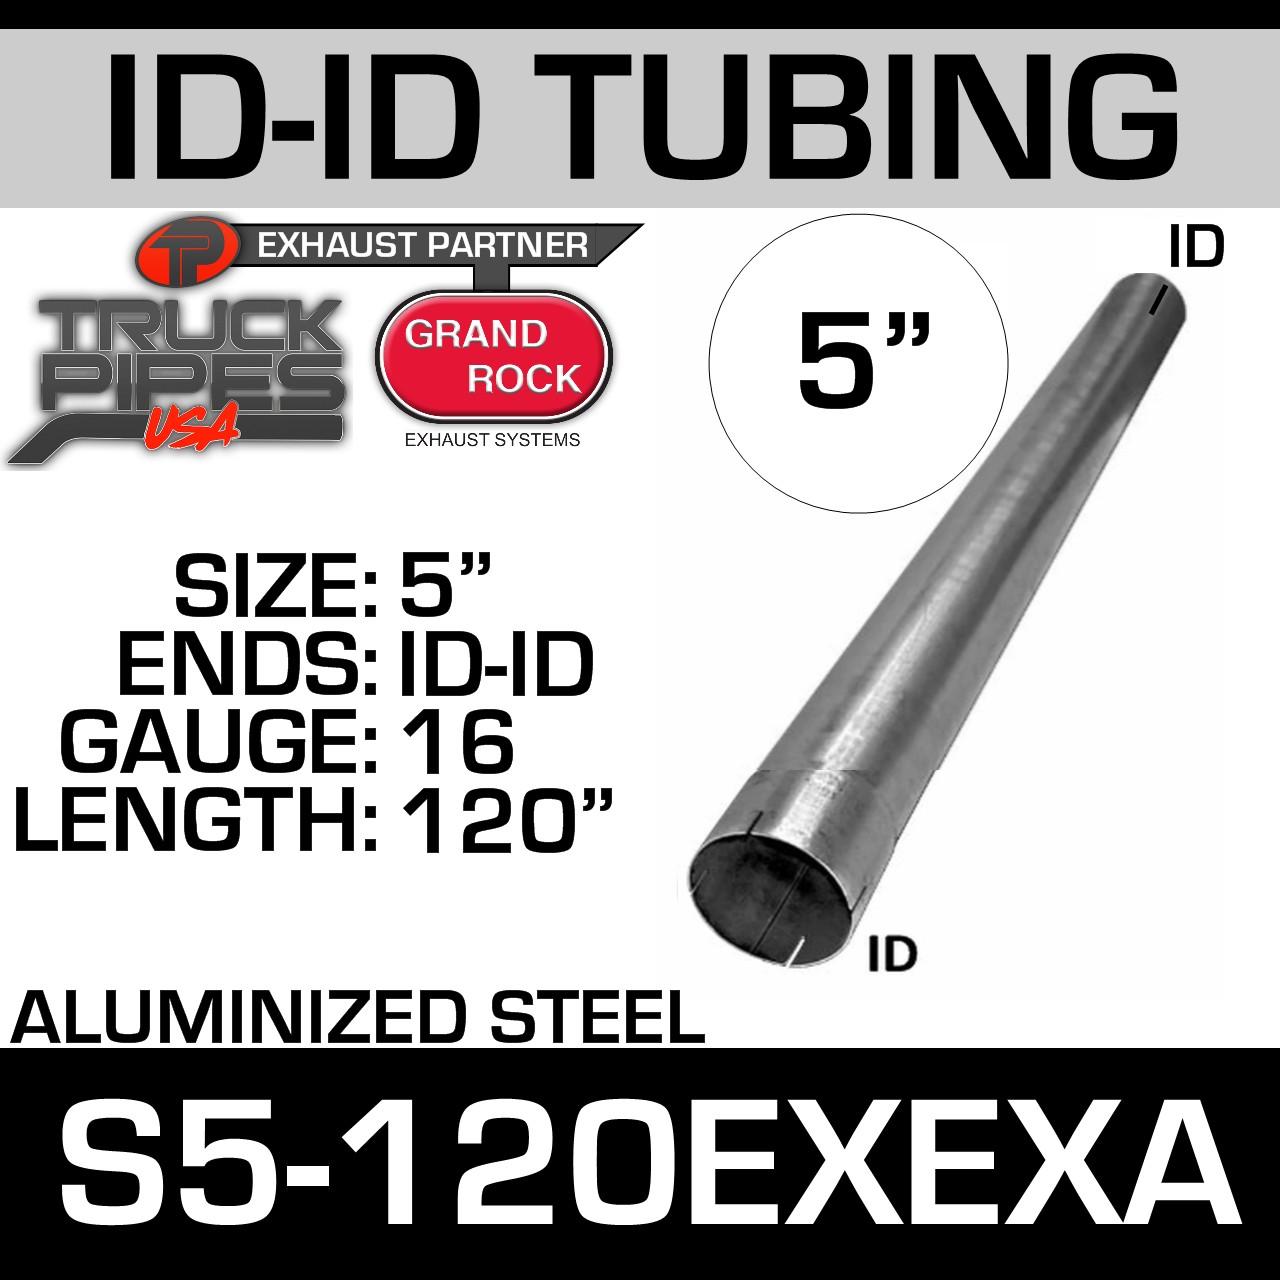 s5-120exexa-aluminized-steel-exhaust-tubing-5-inch-diameter-id-id-end-120-inches-long.jpg